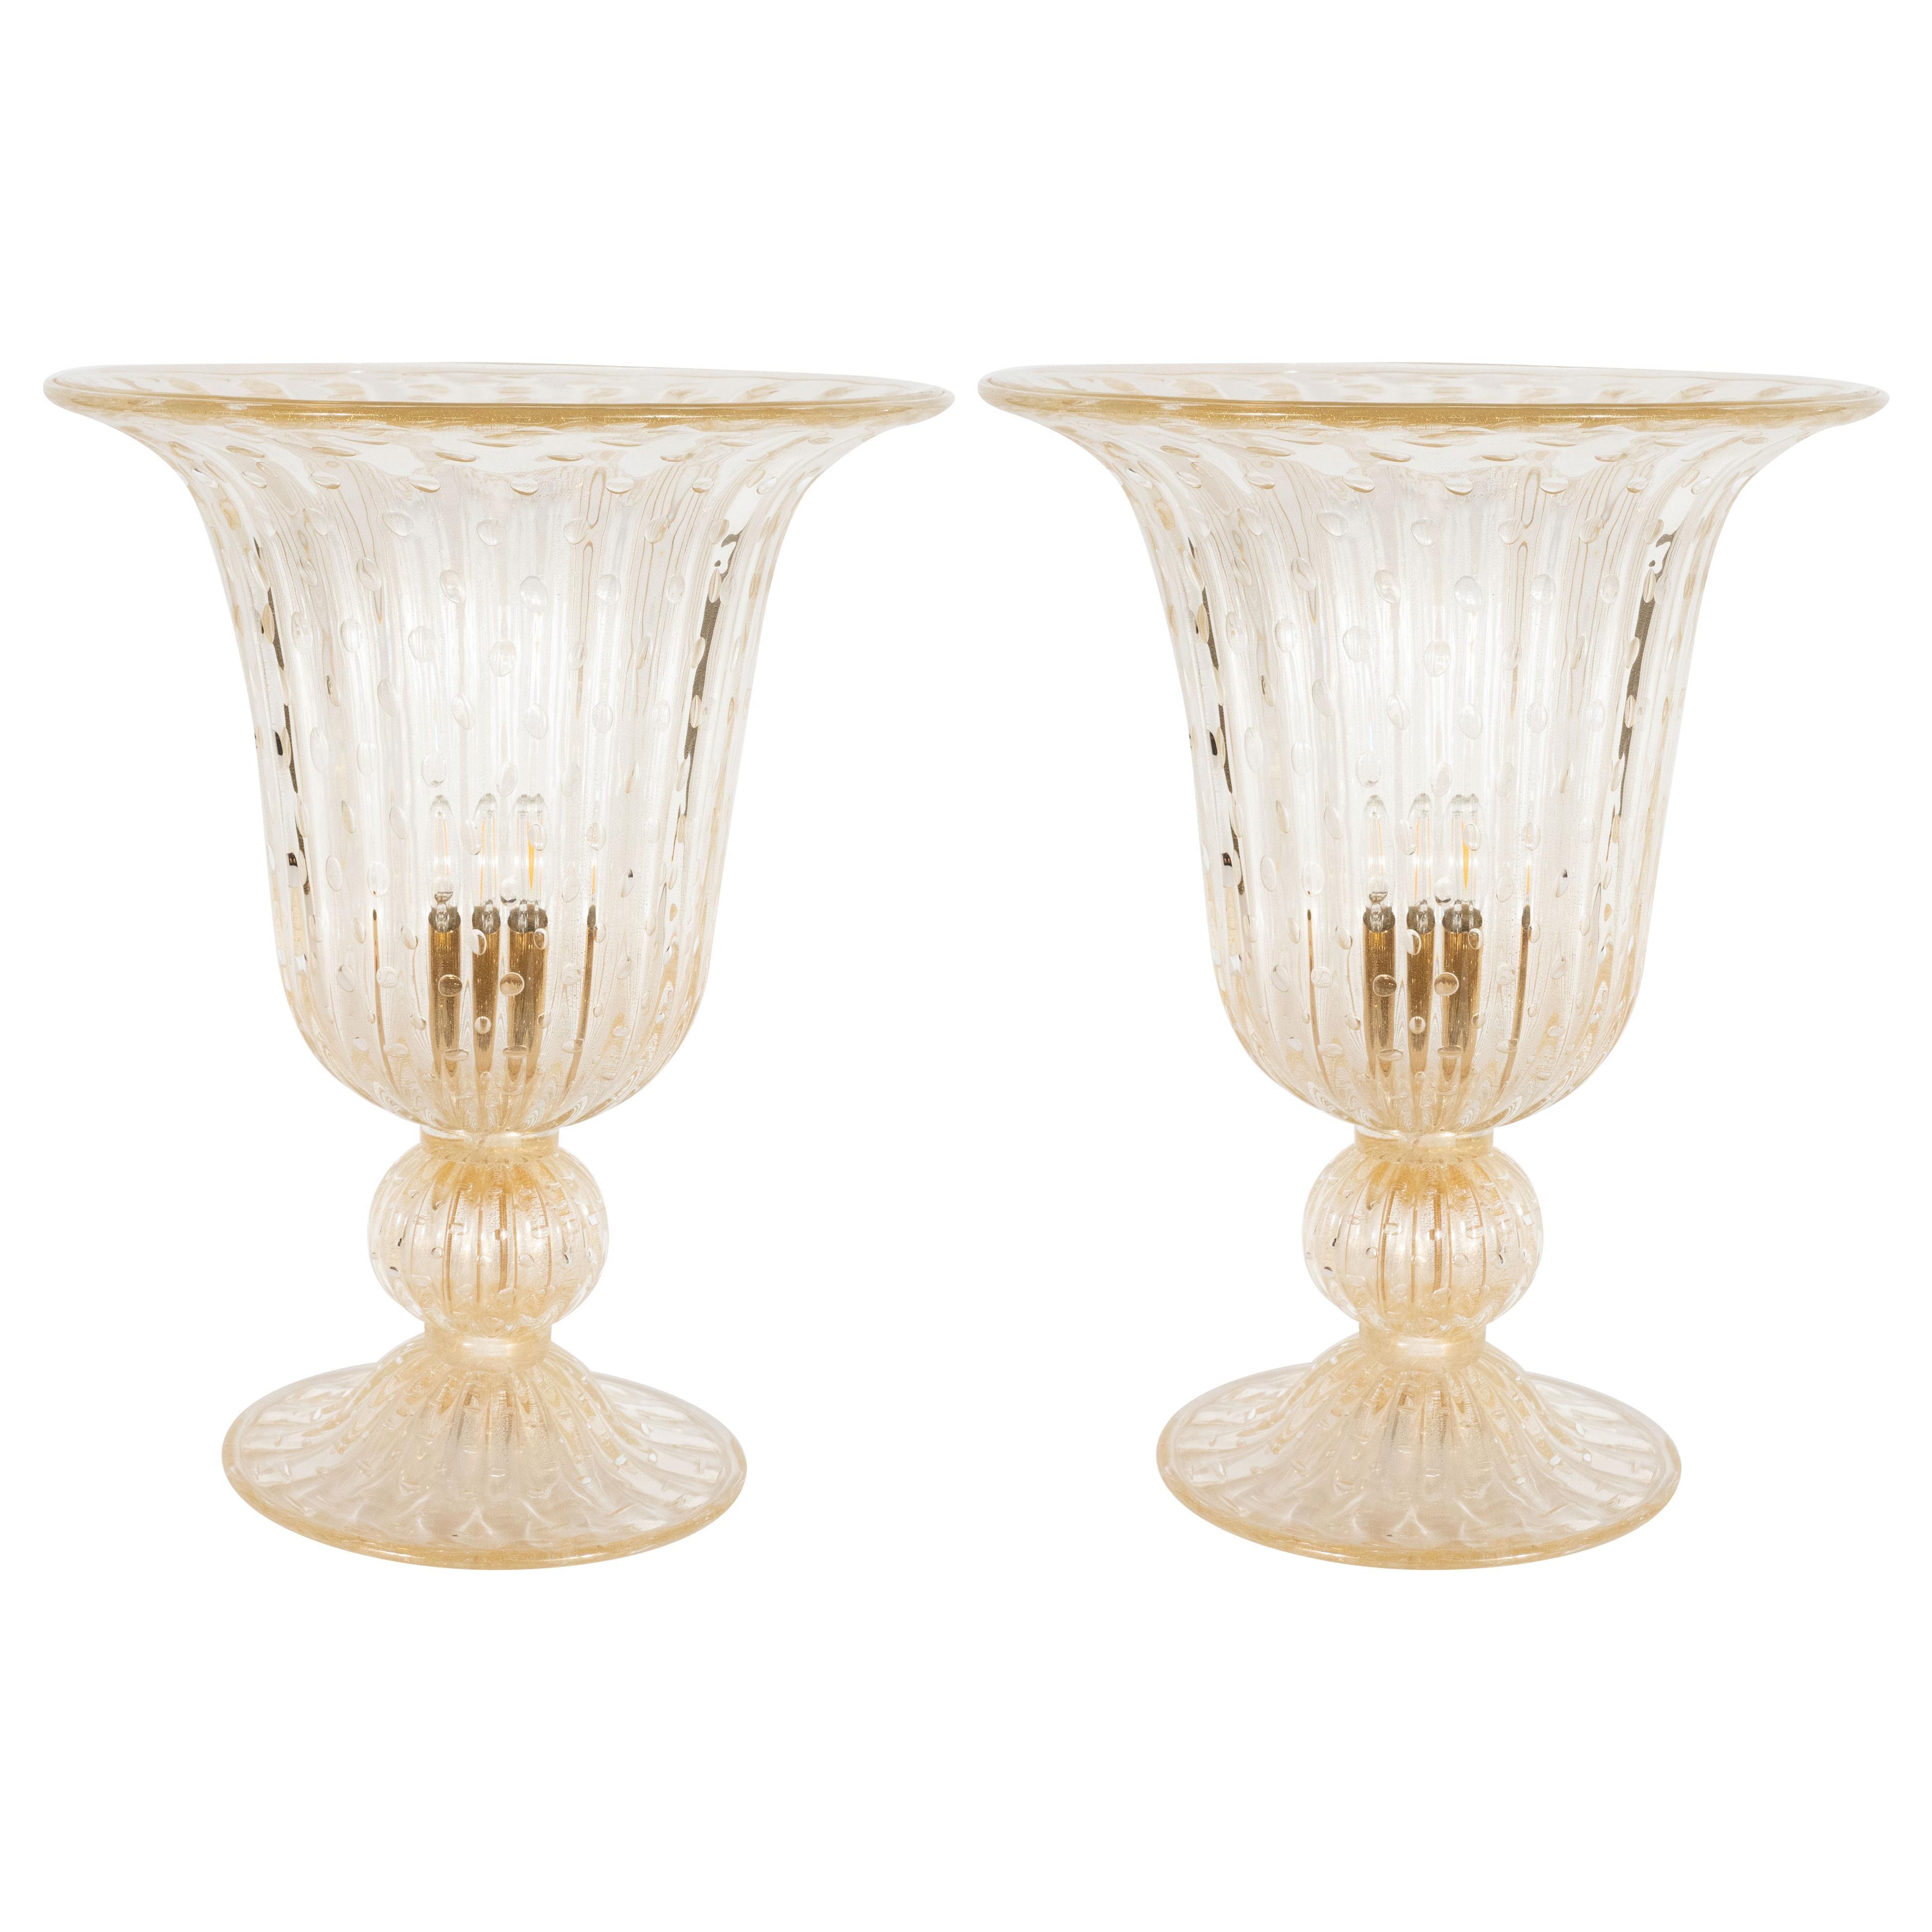 Modernist Handblown Murano Translucent Glass Uplights, 24kt Yellow Gold Flecks